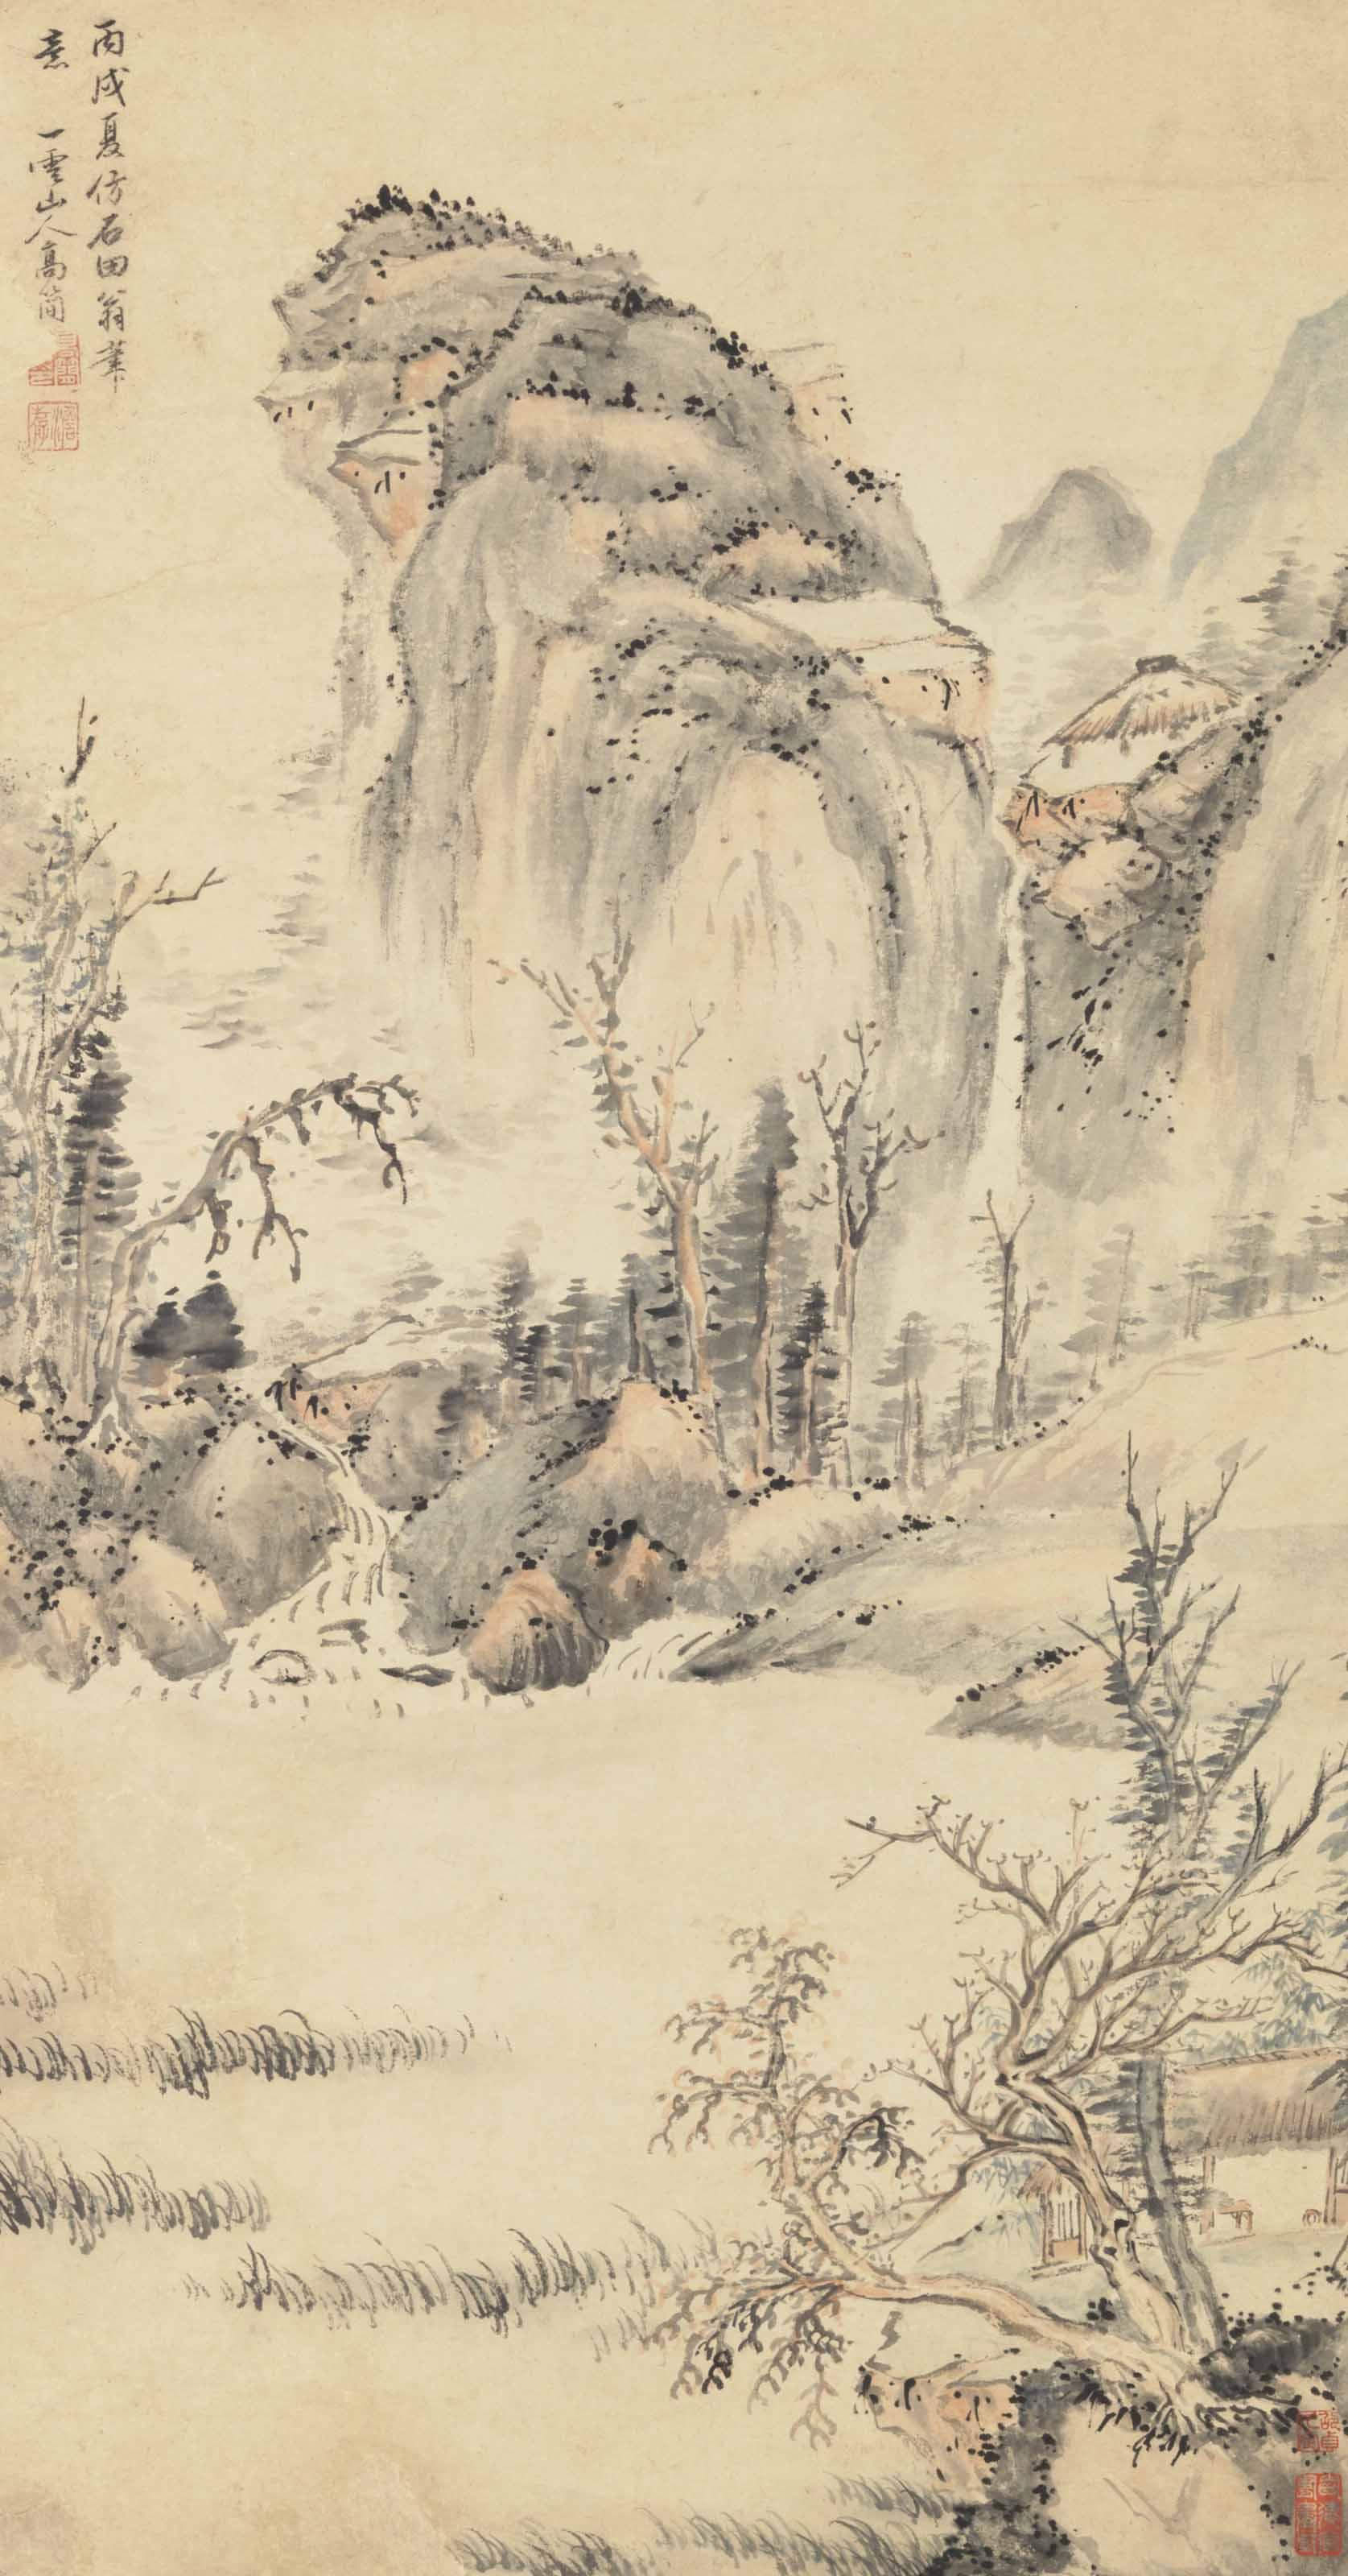 Landscape in the Style of Shen Zhou